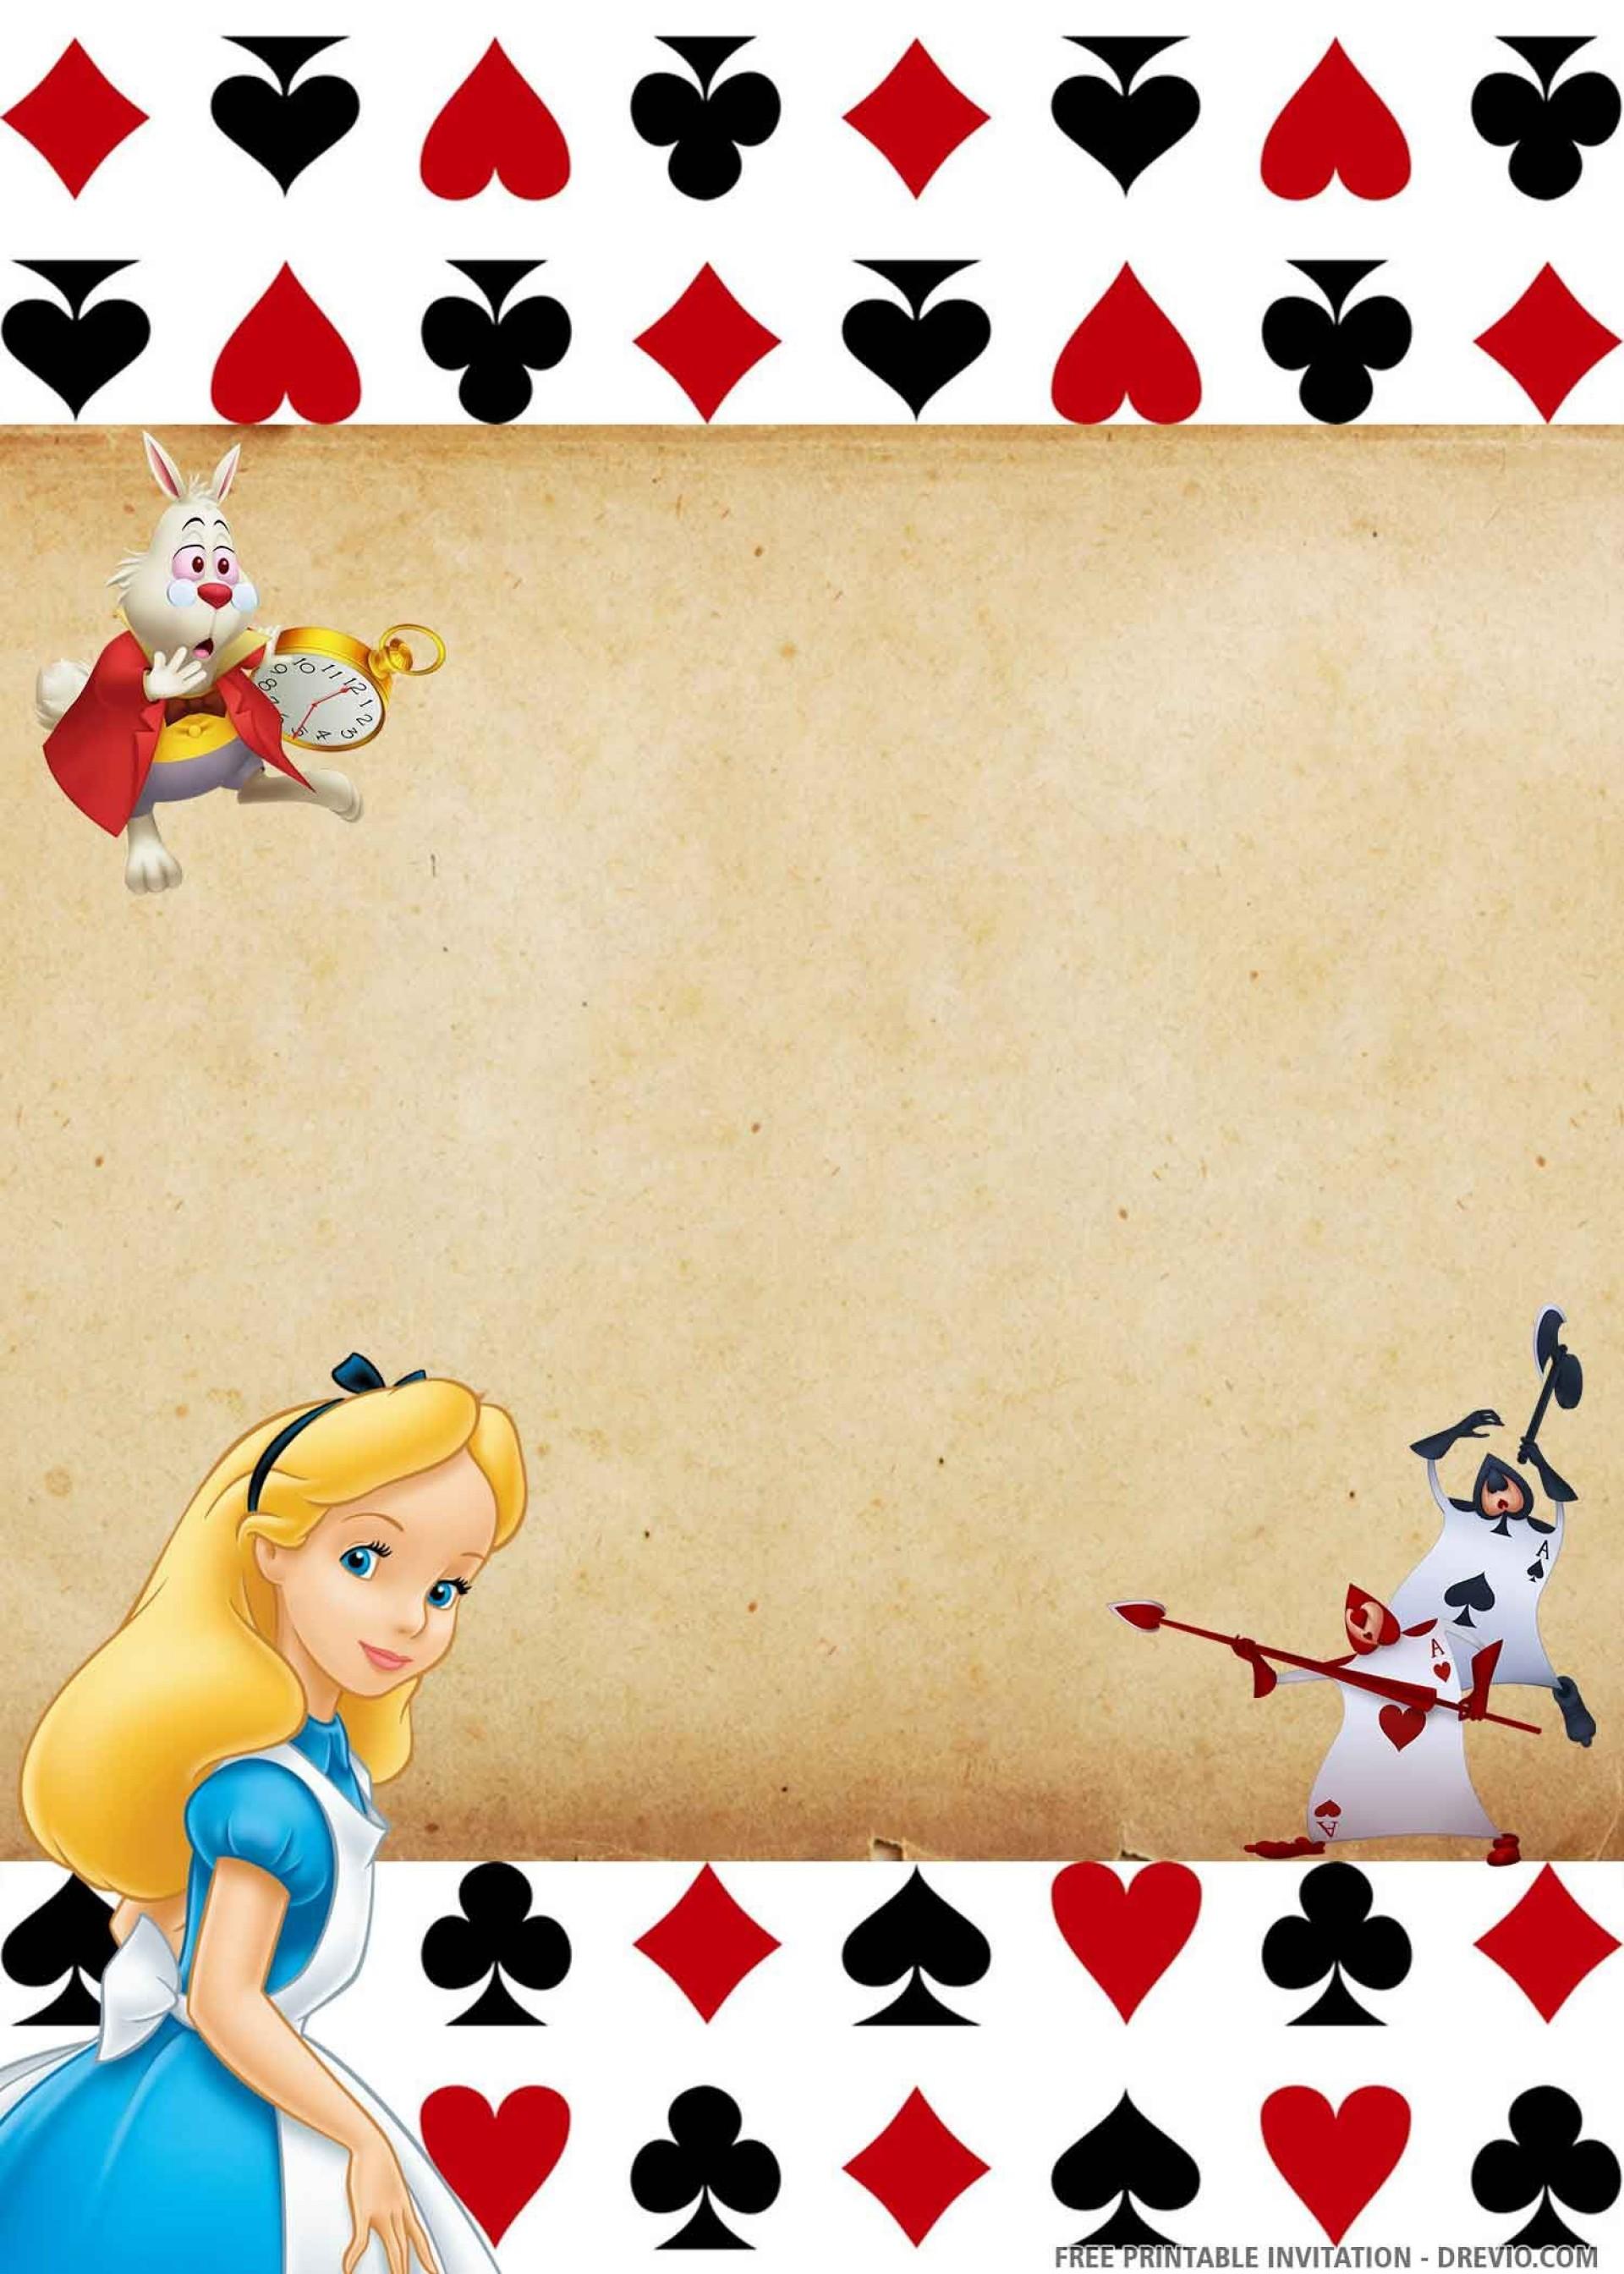 007 Wonderful Alice In Wonderland Birthday Party Invitation Printable Free Design 1920